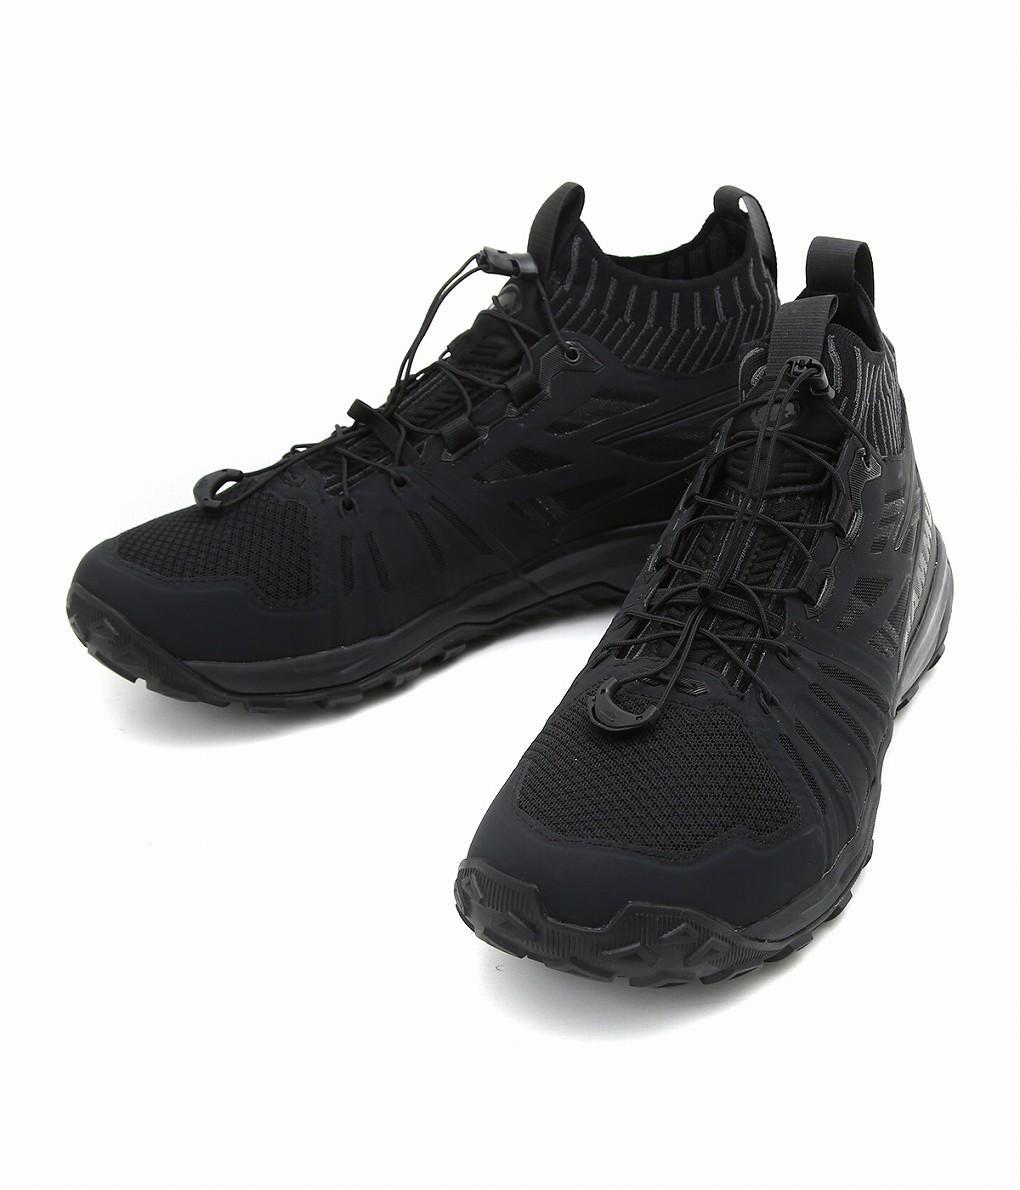 MAMMUT / マムート : Saentis Knit Low Men -black-phantom- : センティスニットロウメン スニーカー シューズ 靴 メンズ : 3030-03390 【AST】